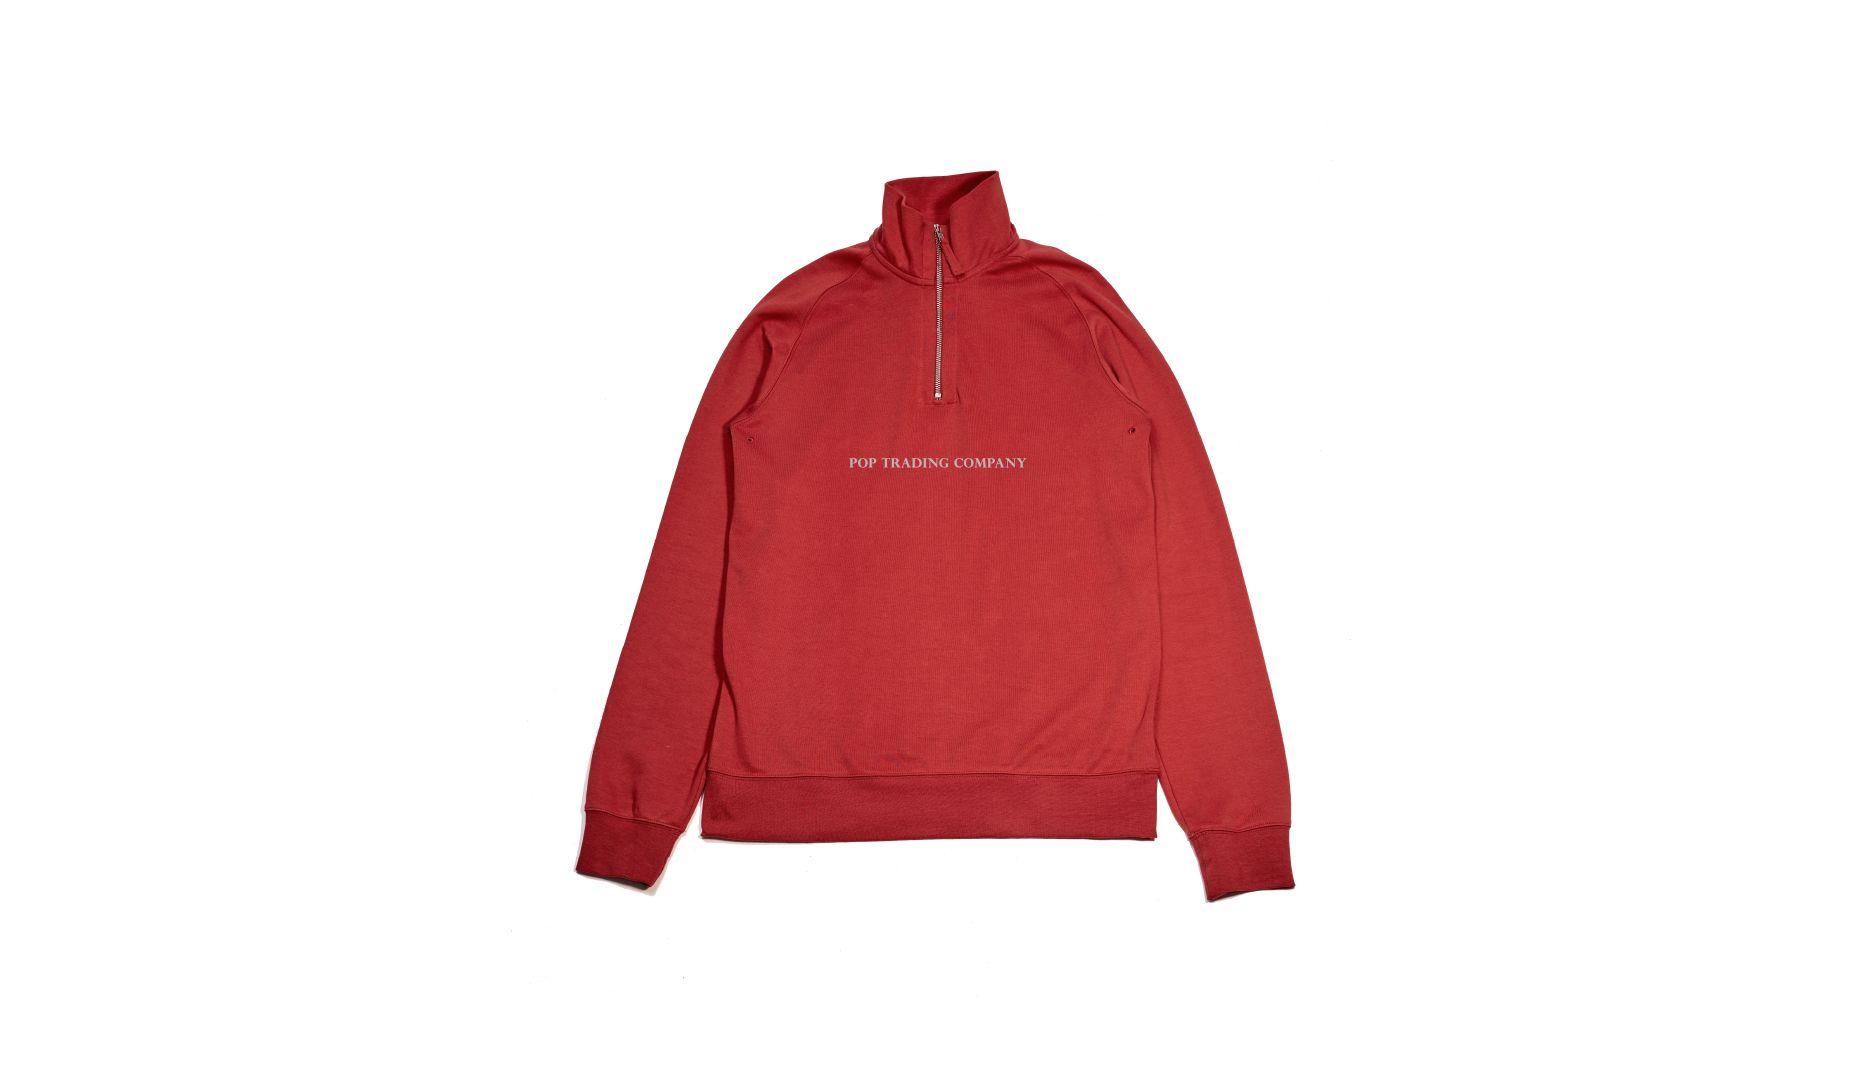 pop-trading-company-ss17-sportswear-lightweight-half-zip-pepper-red